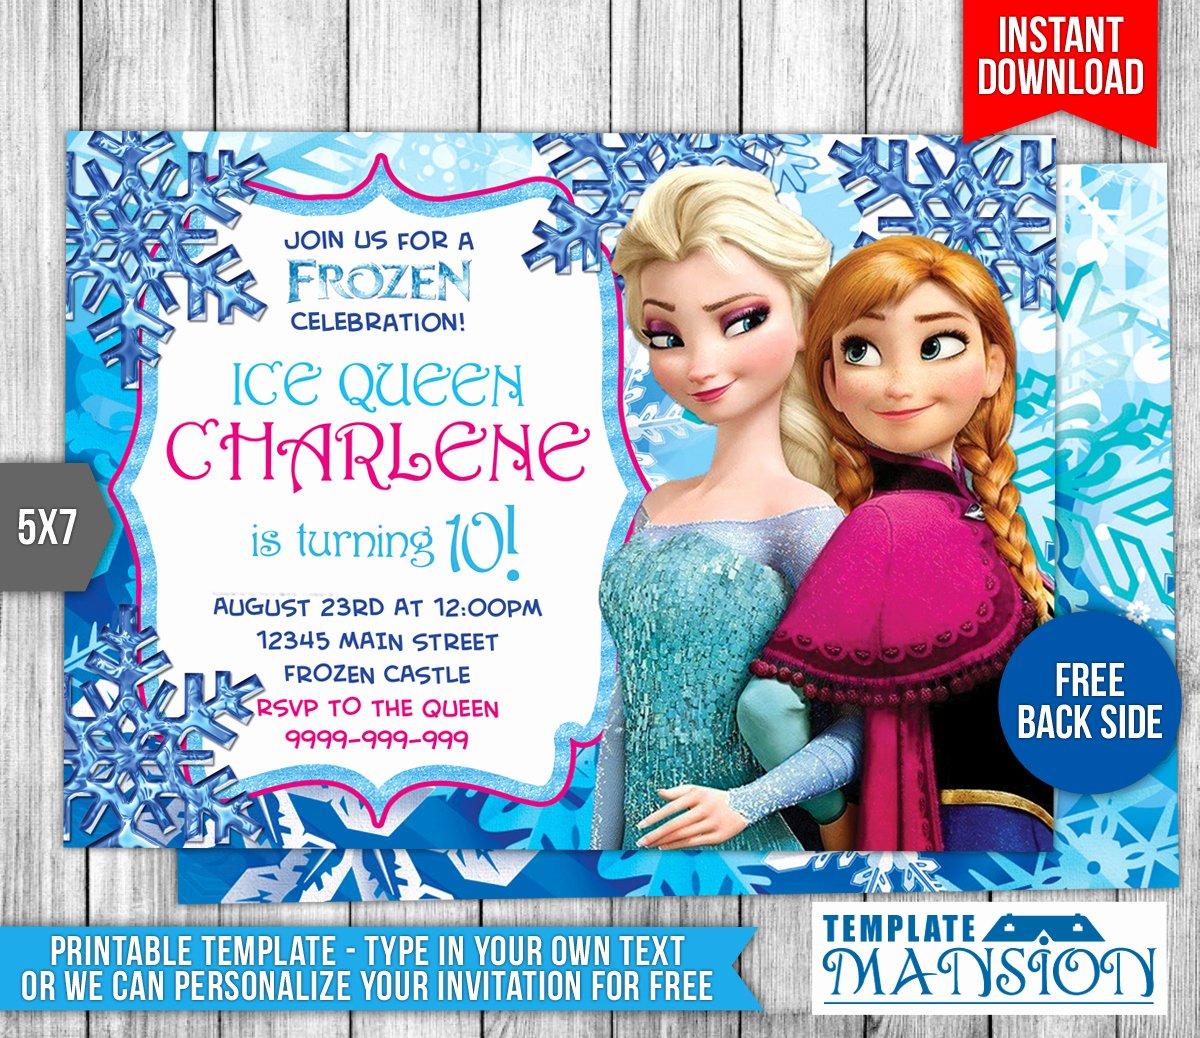 Frozen Invitation Template Free Download Best Of Disney Frozen Birthday Invitation by Templatemansion On